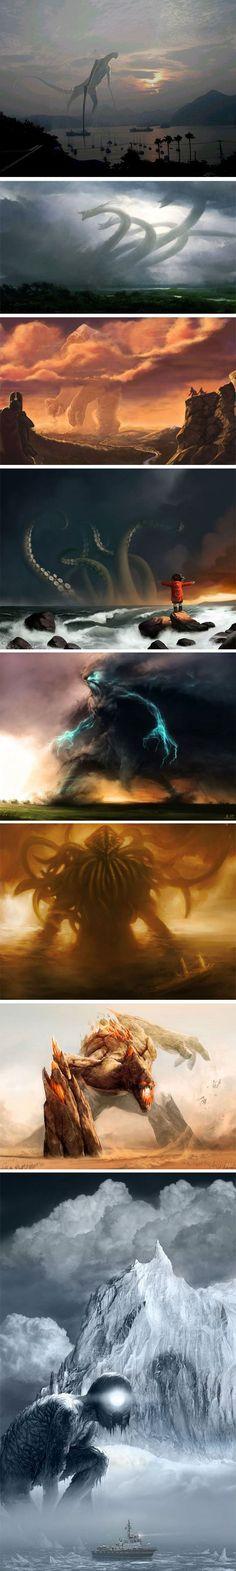 Dark Fantasy Art, Fantasy Artwork, Fantasy World, Dark Art, Fantasy Creatures, Mythical Creatures, Creature Concept, Monster Art, Creature Design